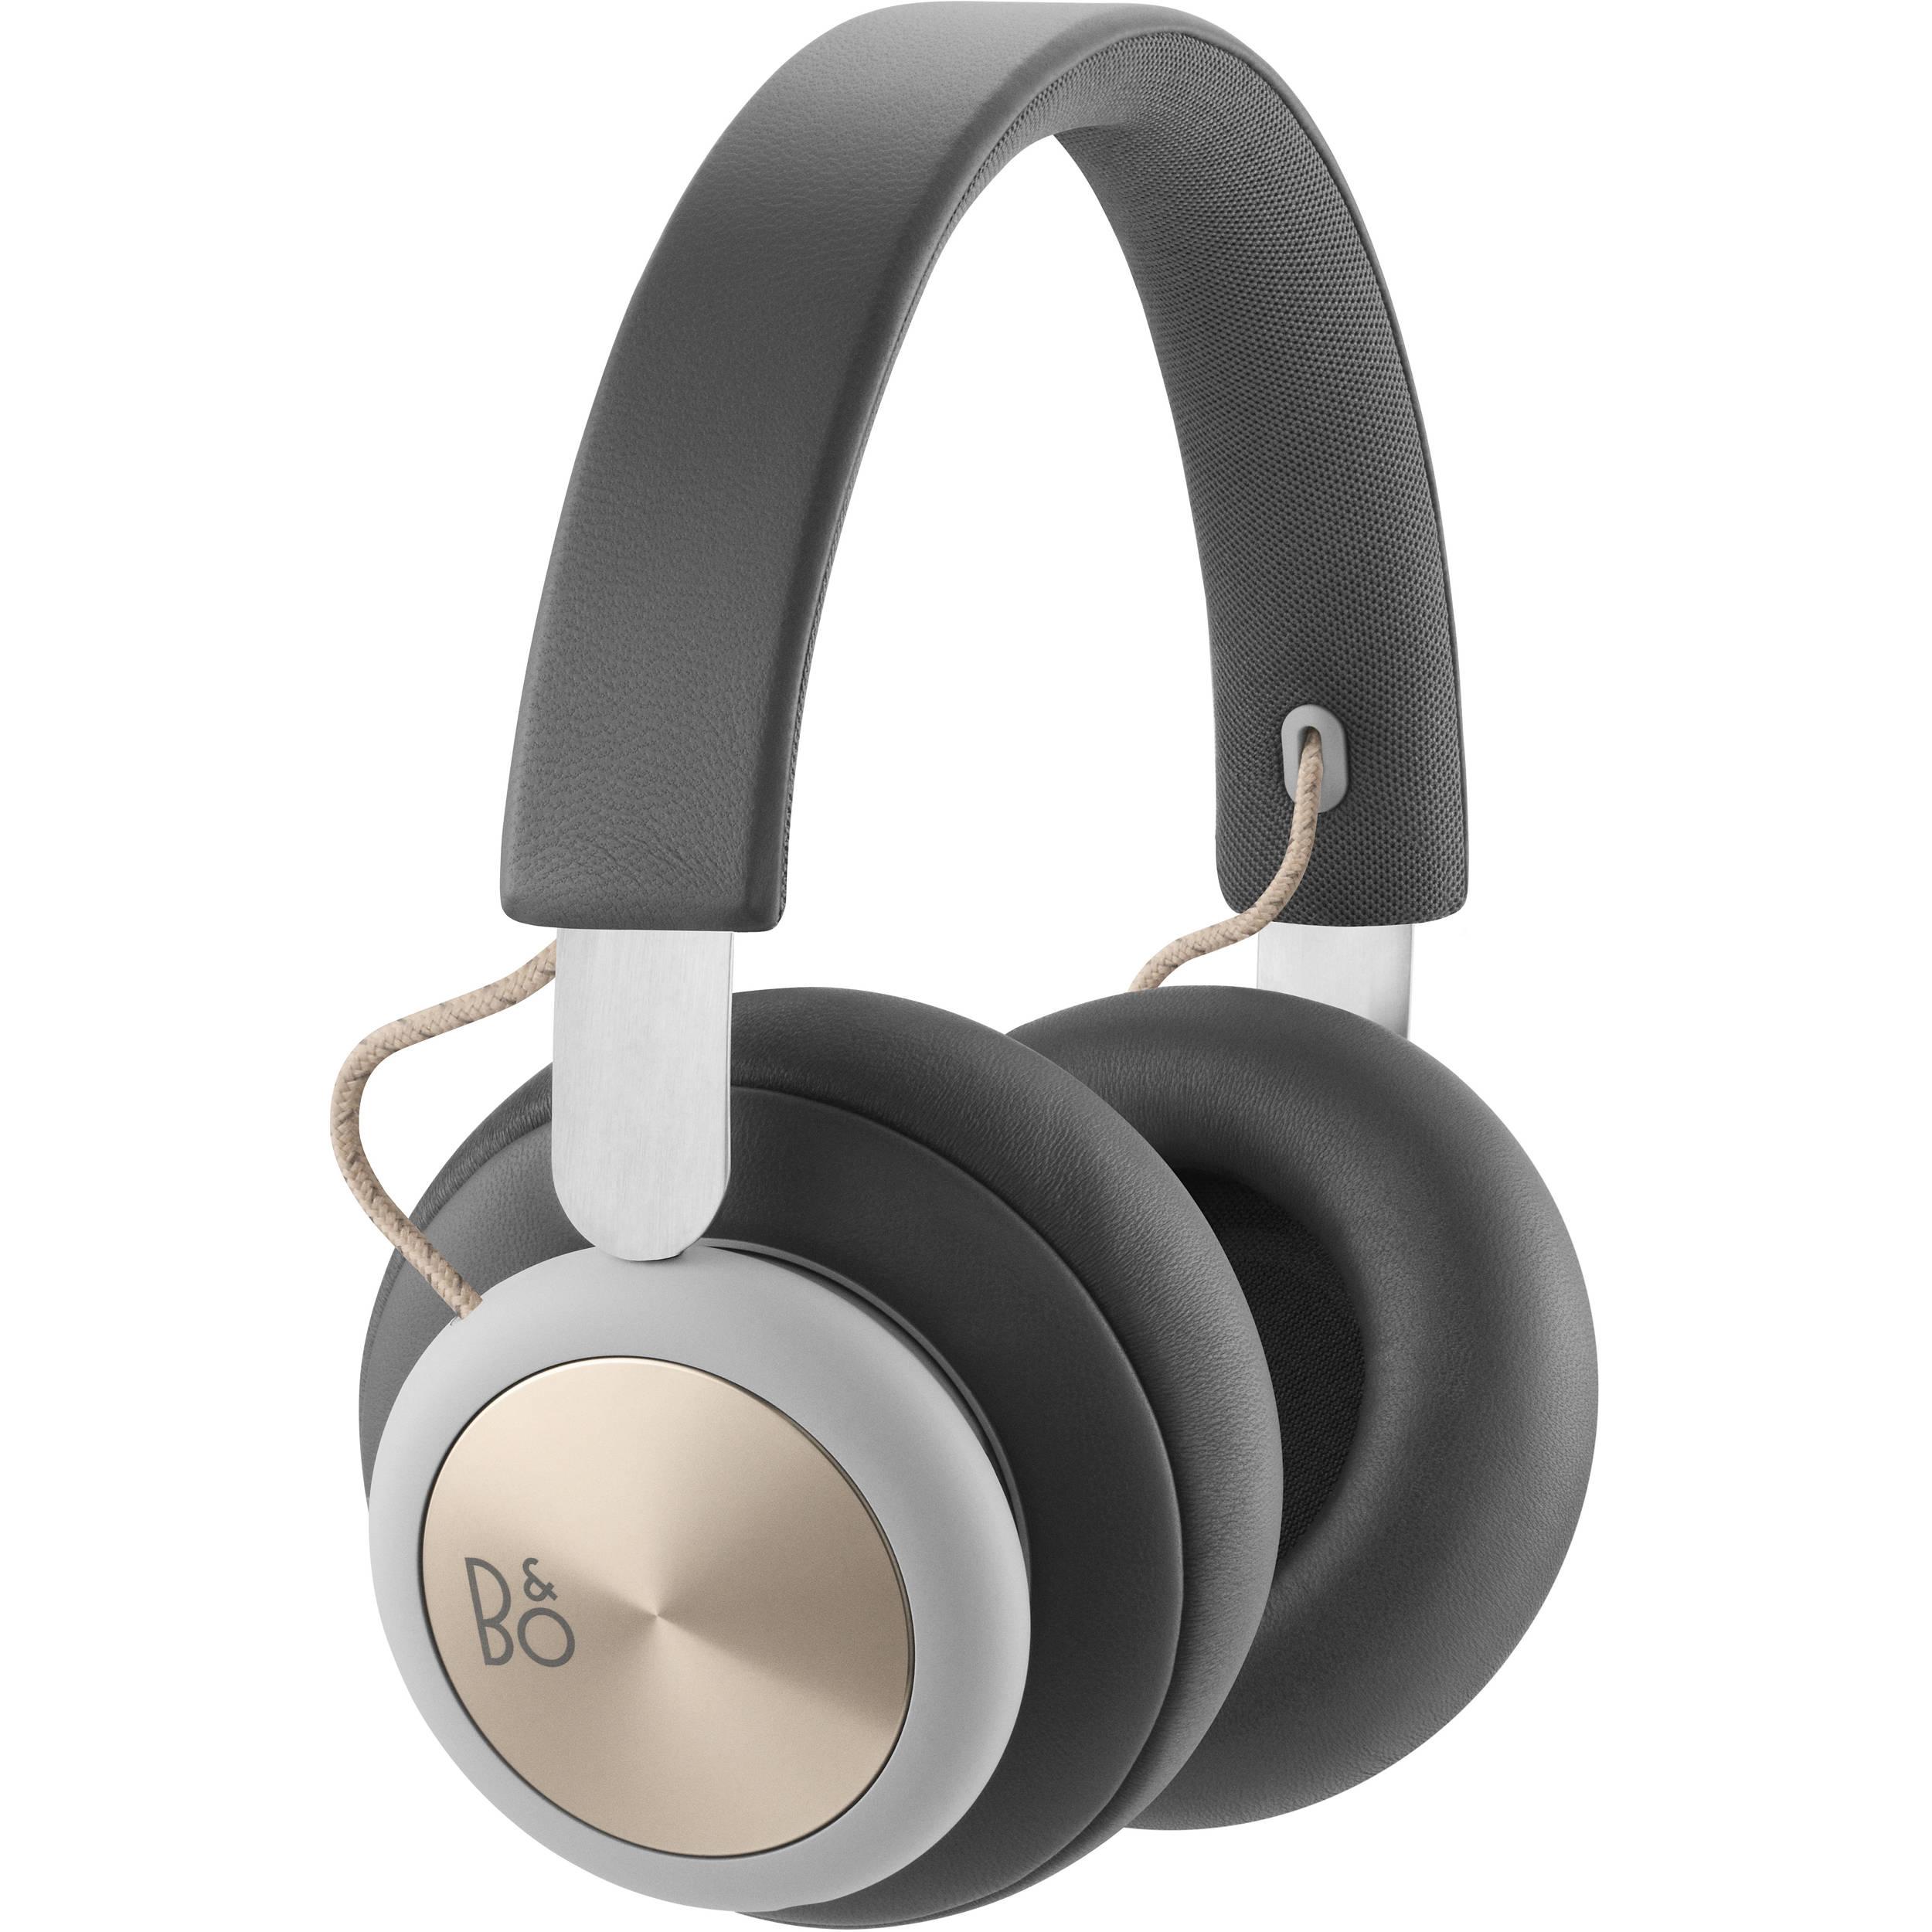 1dd1df05ed8f93 Bang & Olufsen Beoplay H4 Bluetooth Wireless Over-Ear 1643874